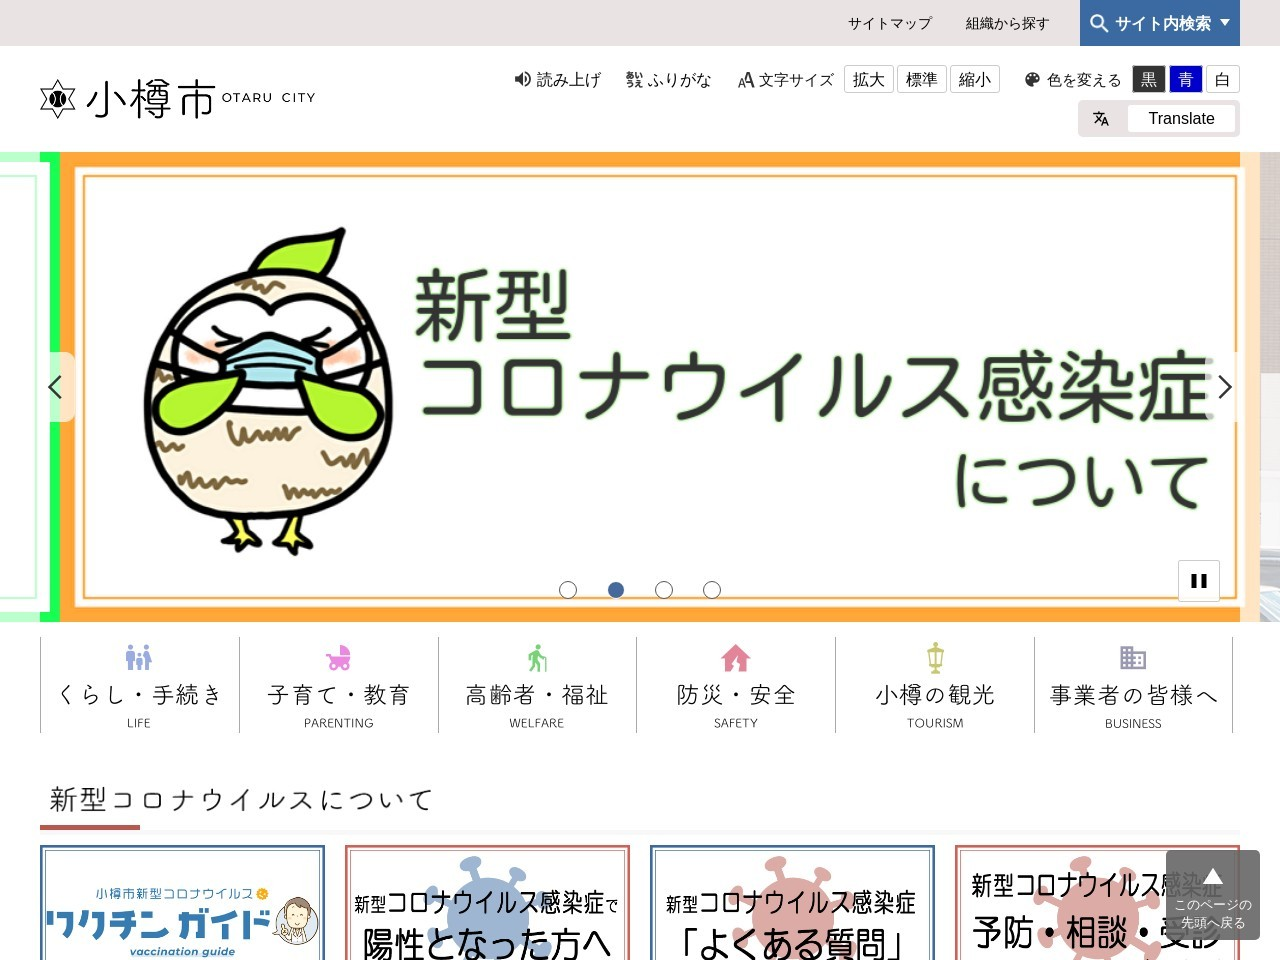 https://www.city.otaru.lg.jp/hokenjo/iryou/iryou_sinryoujo.html